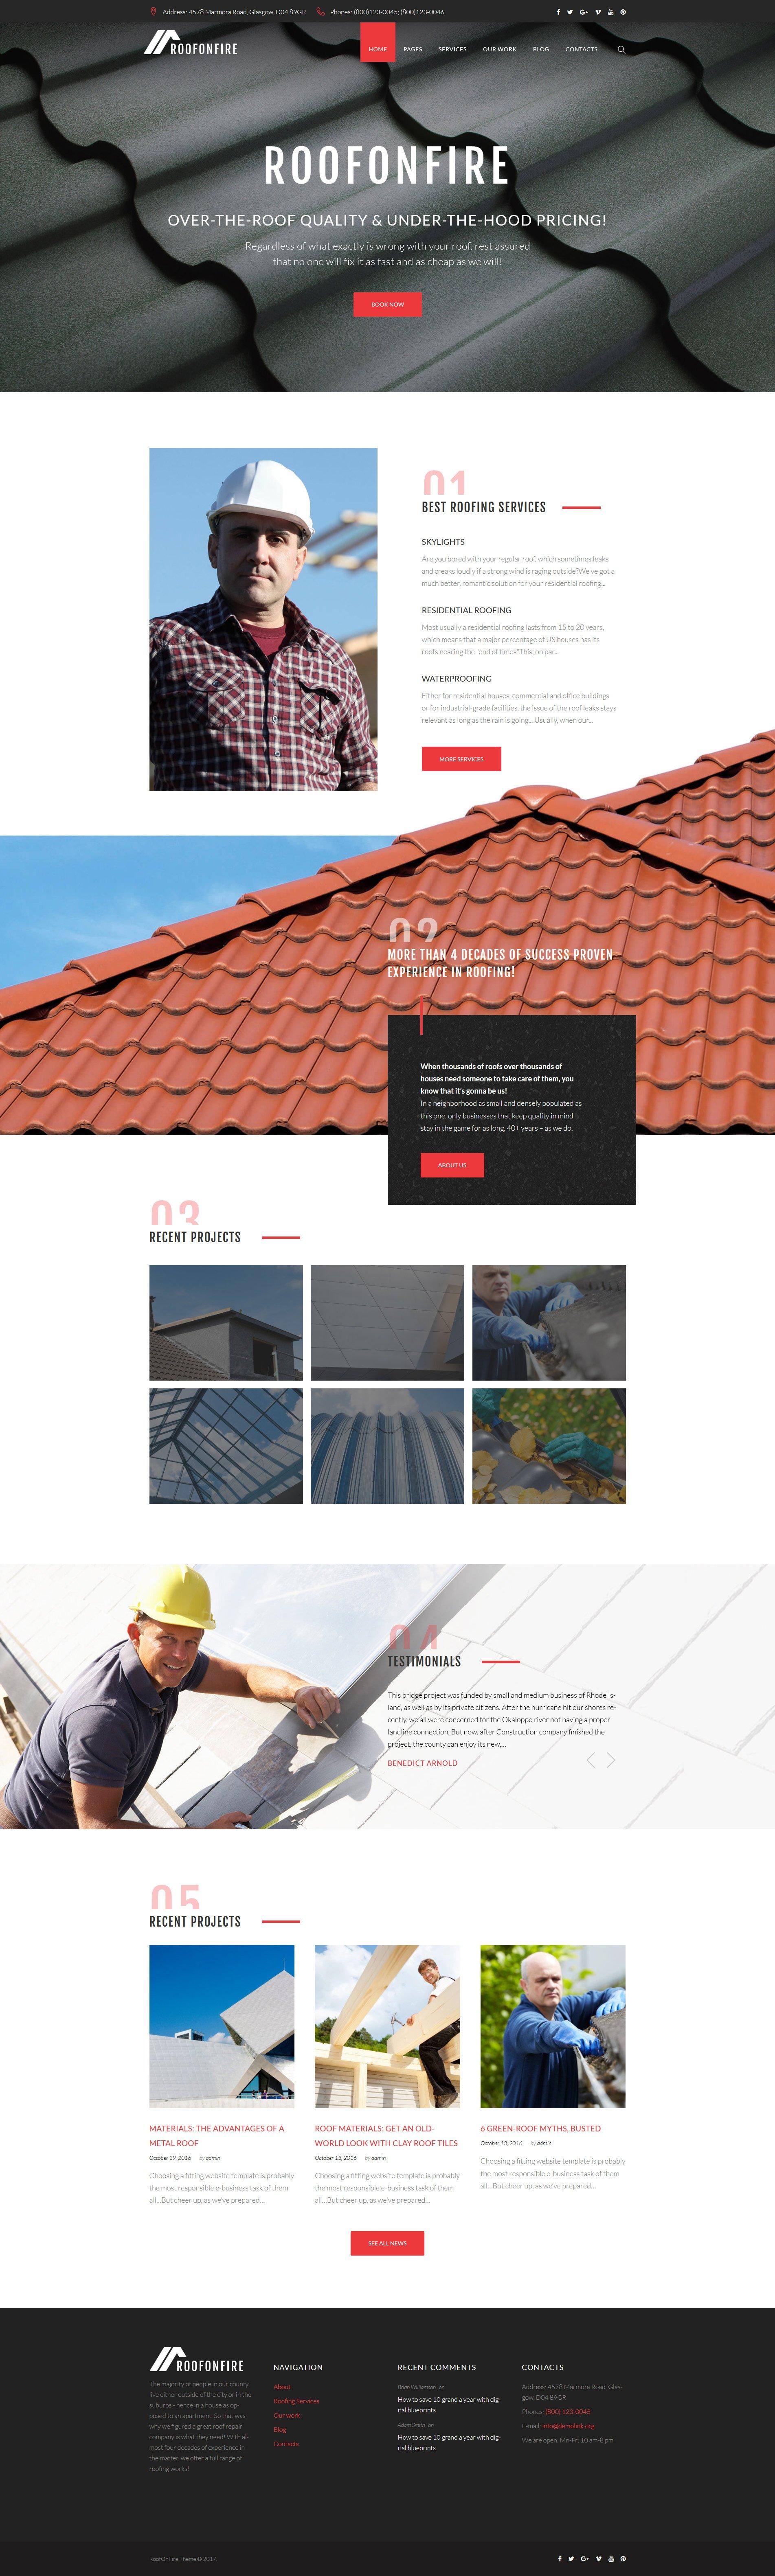 RoofOnFire - Roofing Company Responsive WordPress Theme - screenshot